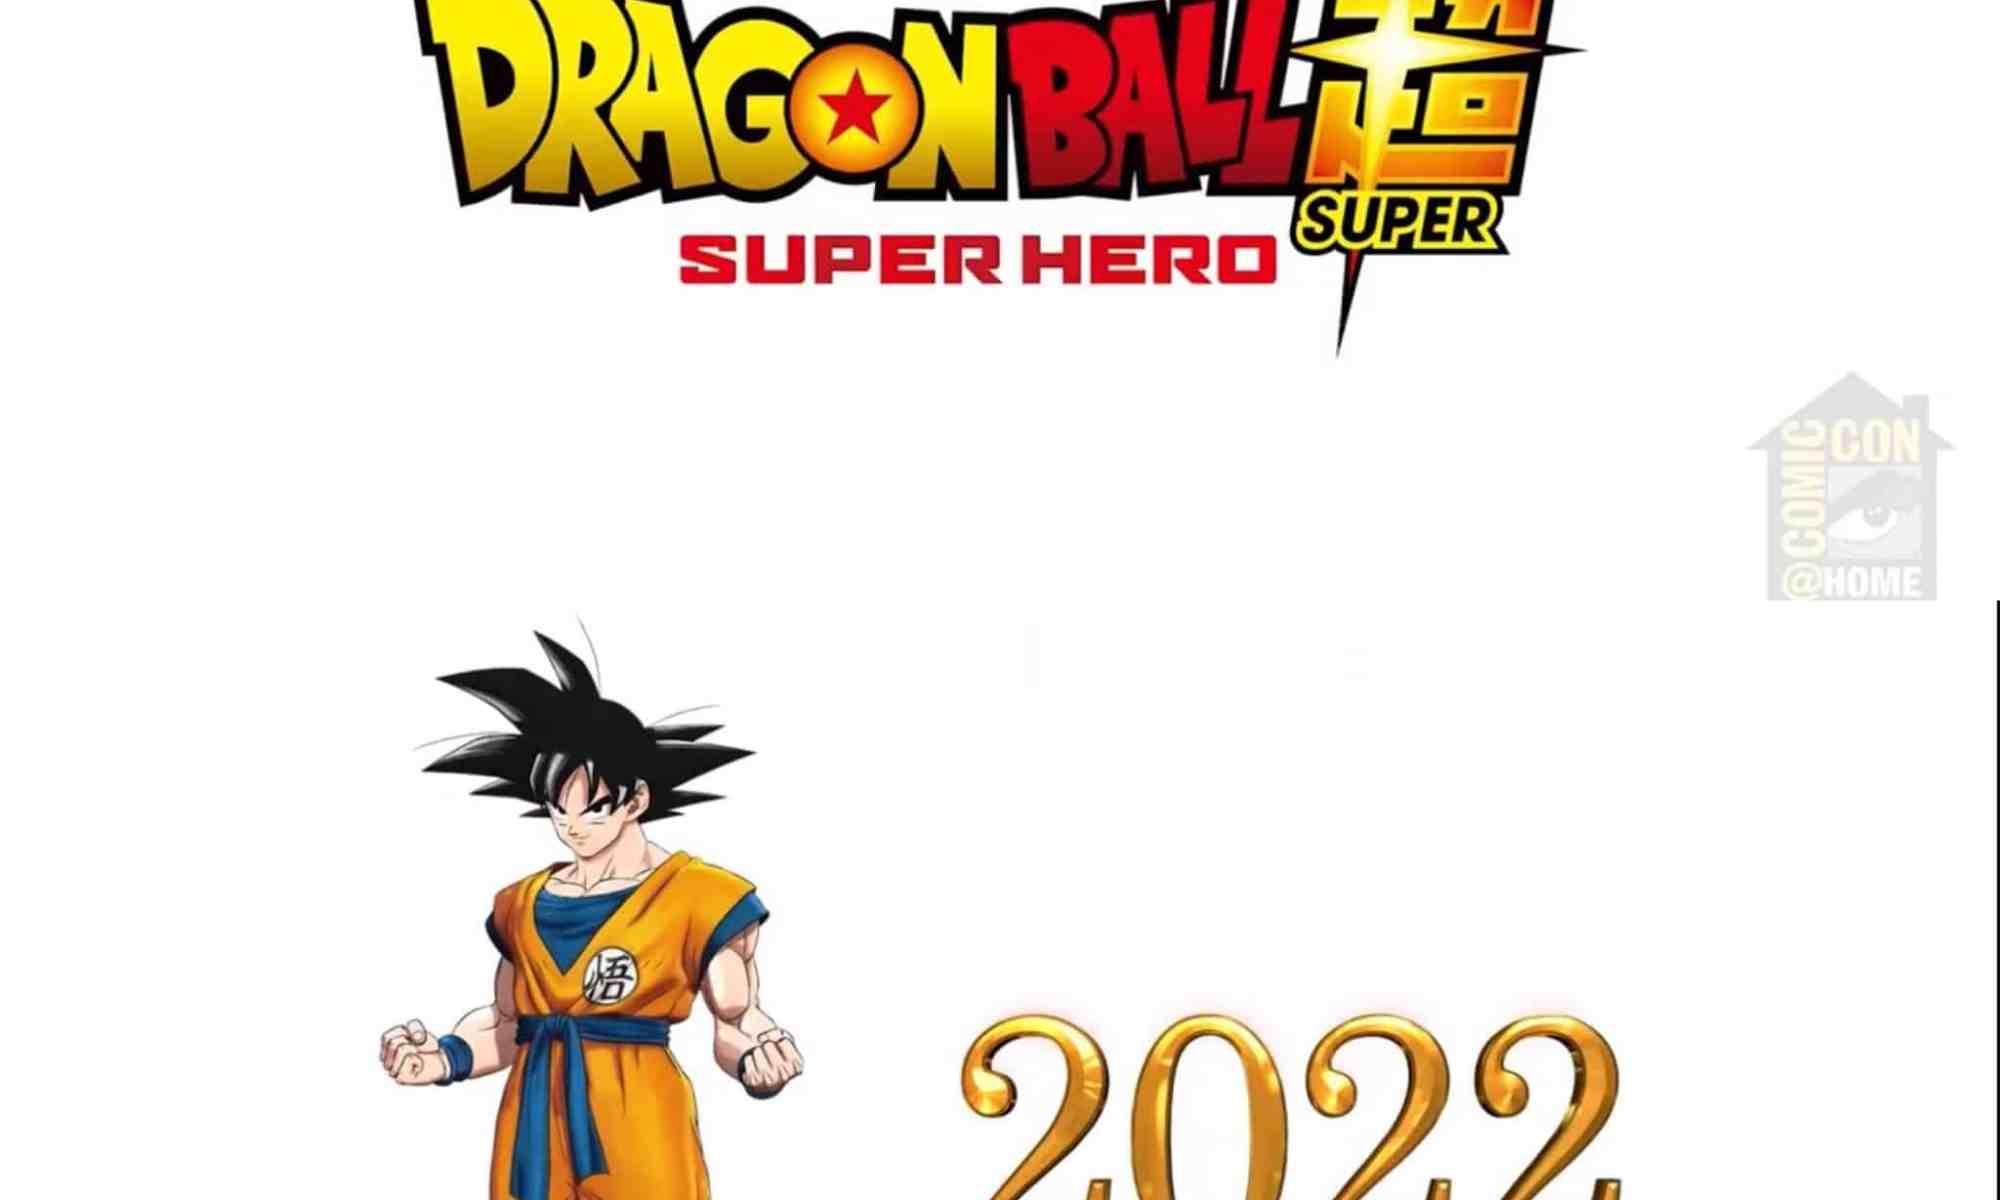 SDCC 2021 Dragon Ball Special Panel-Dragon Ball Super Super Hero